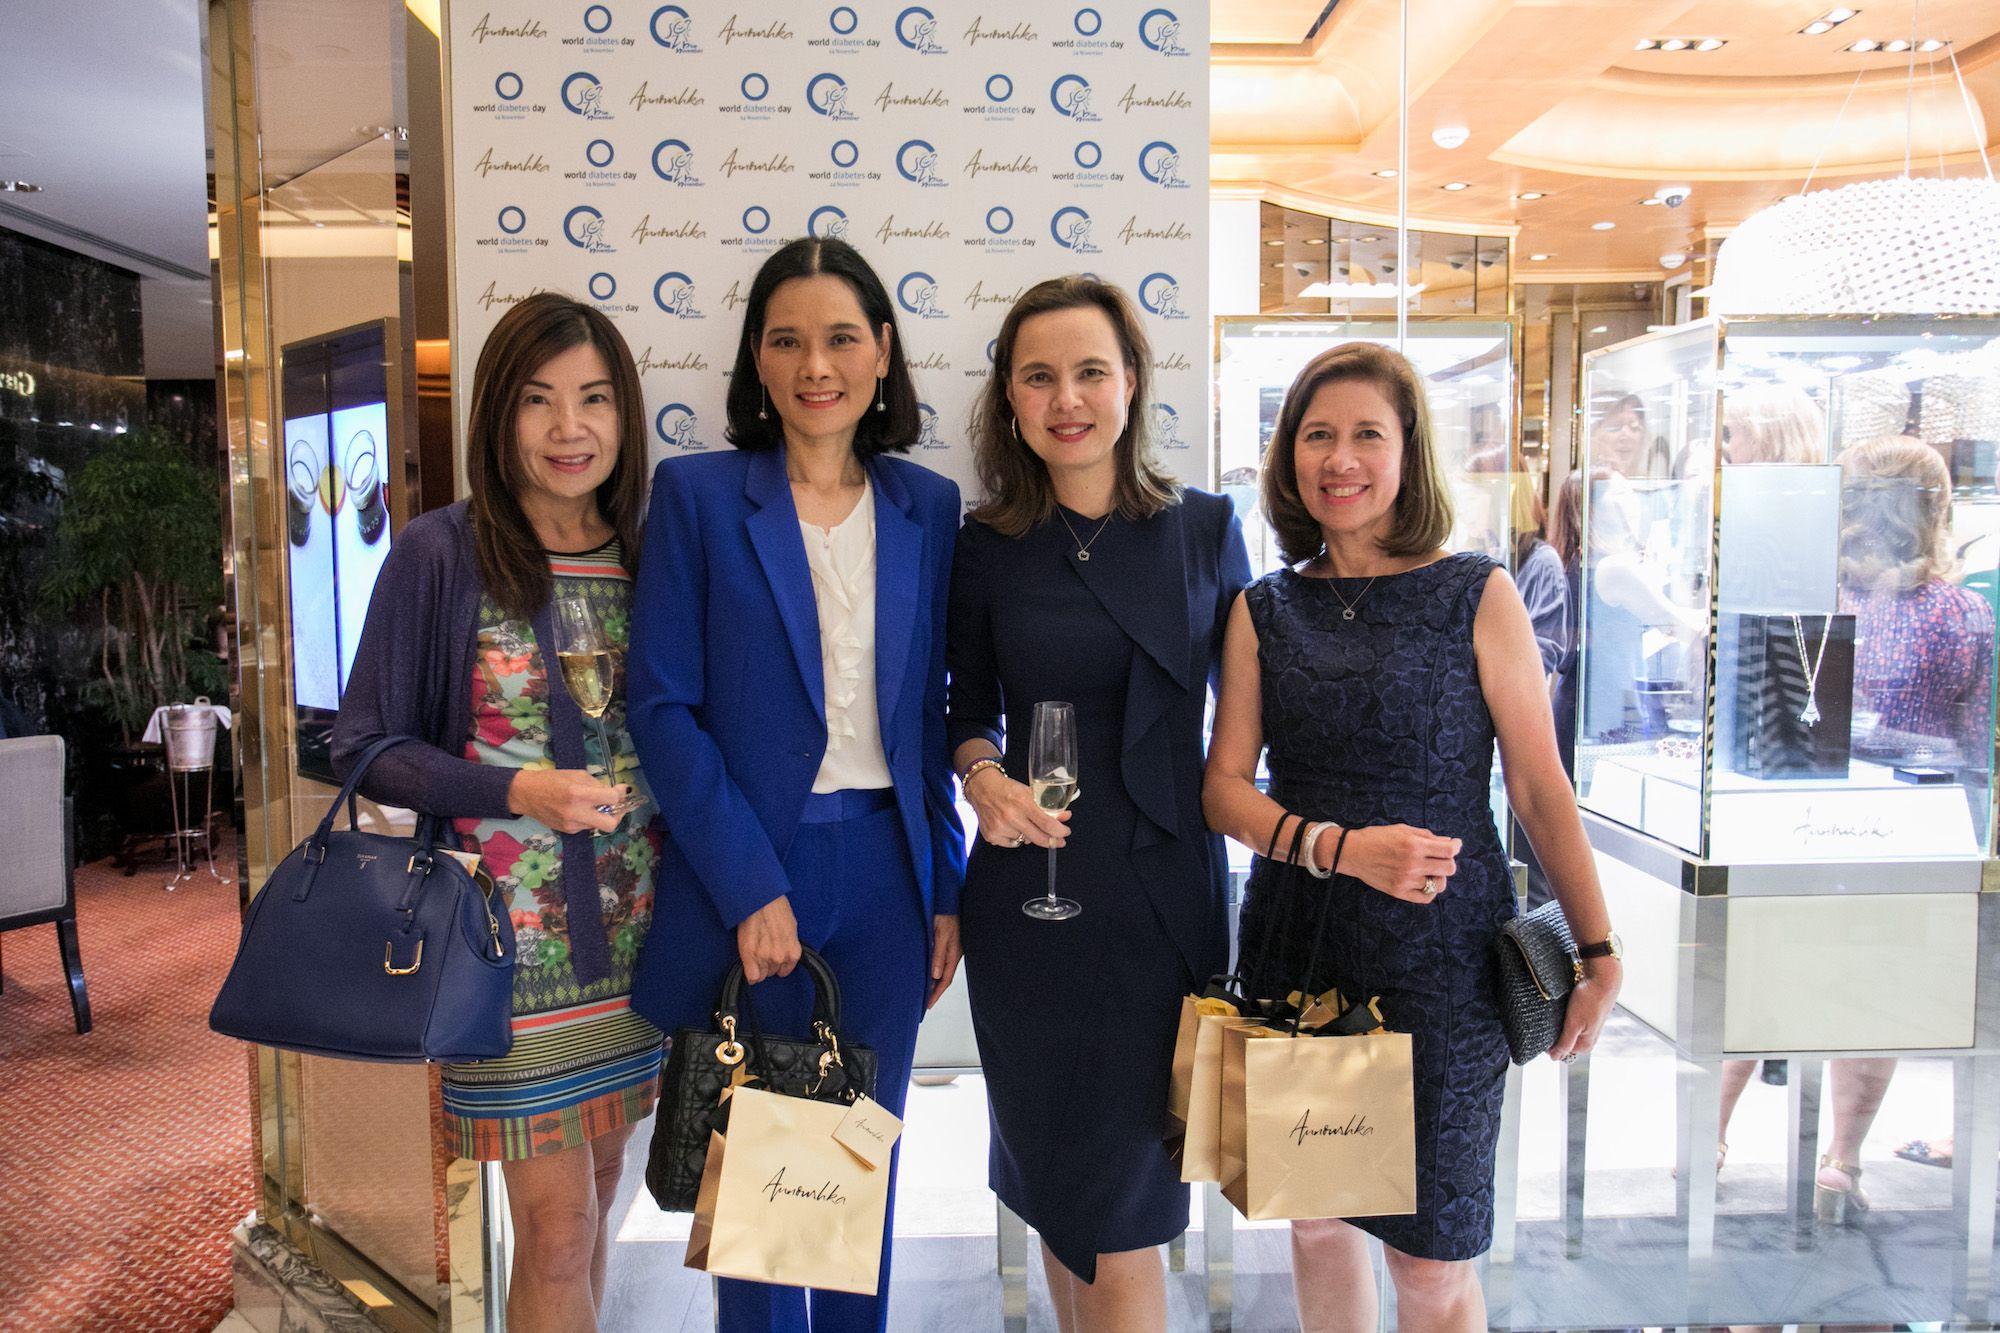 Esther Ma, Joy Slosar, Joanna Hotung, Carmen Beaves